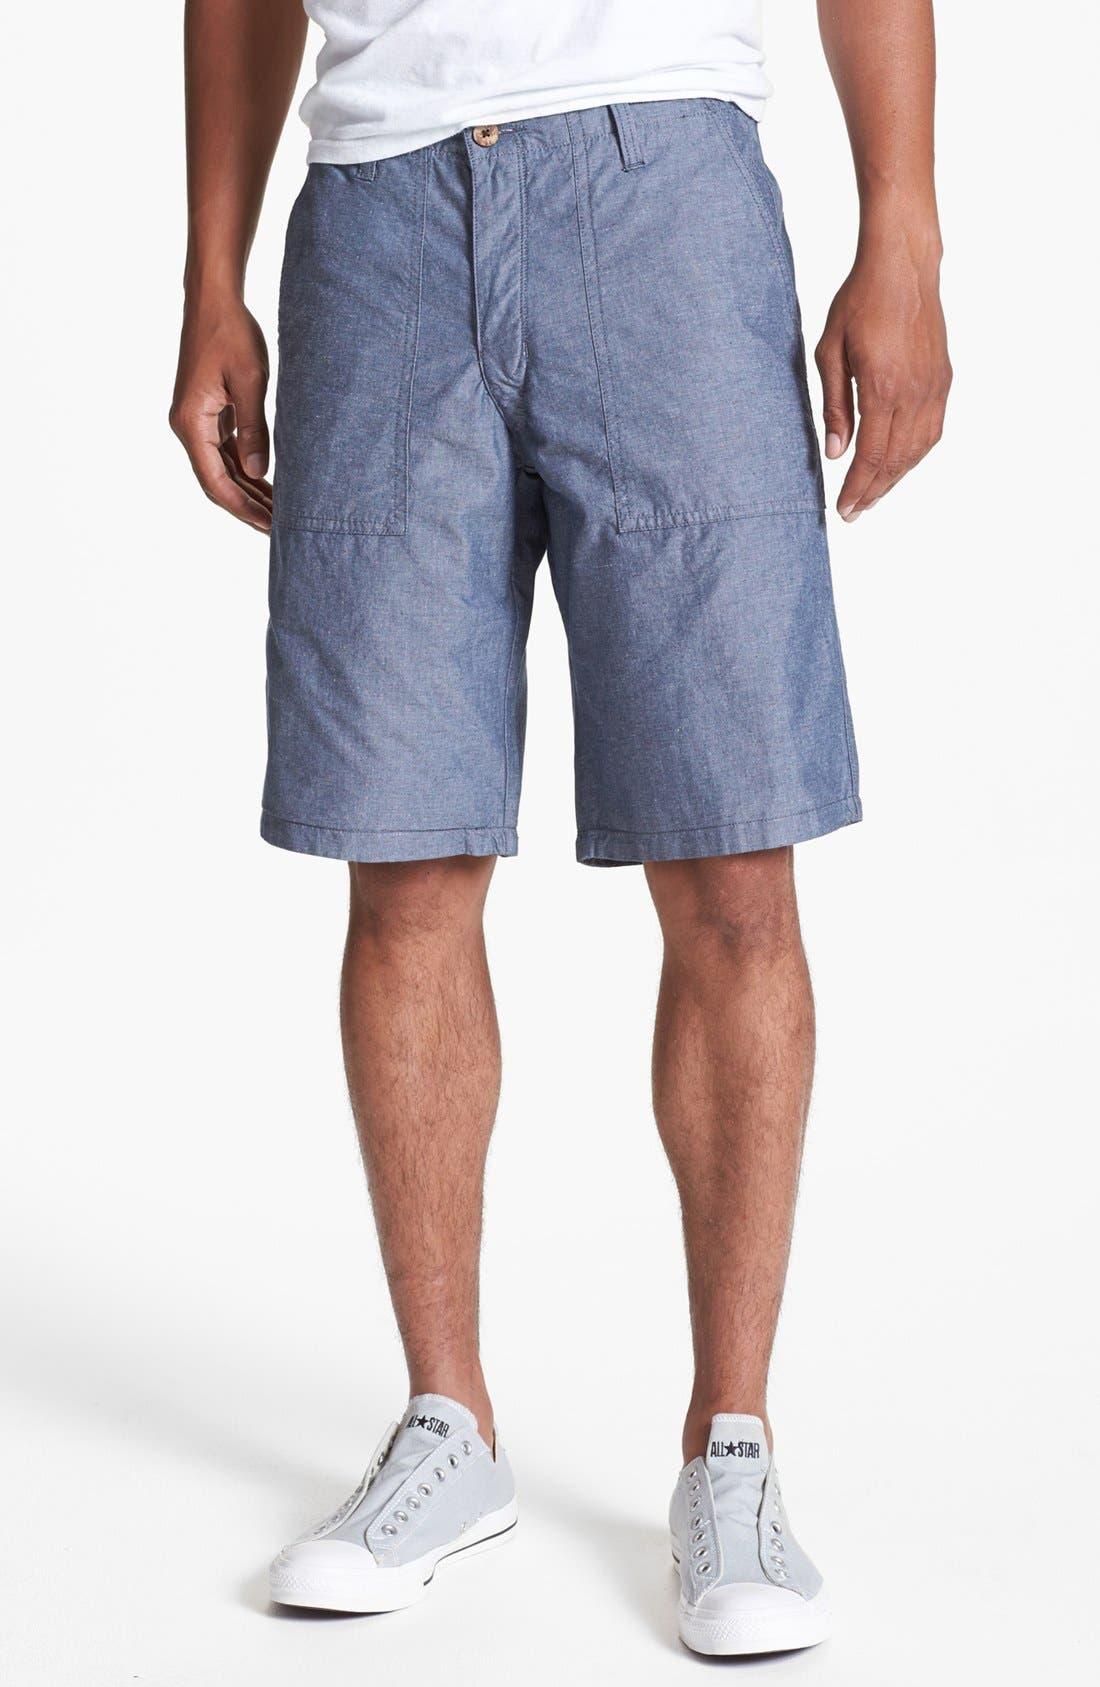 Alternate Image 1 Selected - Dockers® Reversible Flat Front Shorts